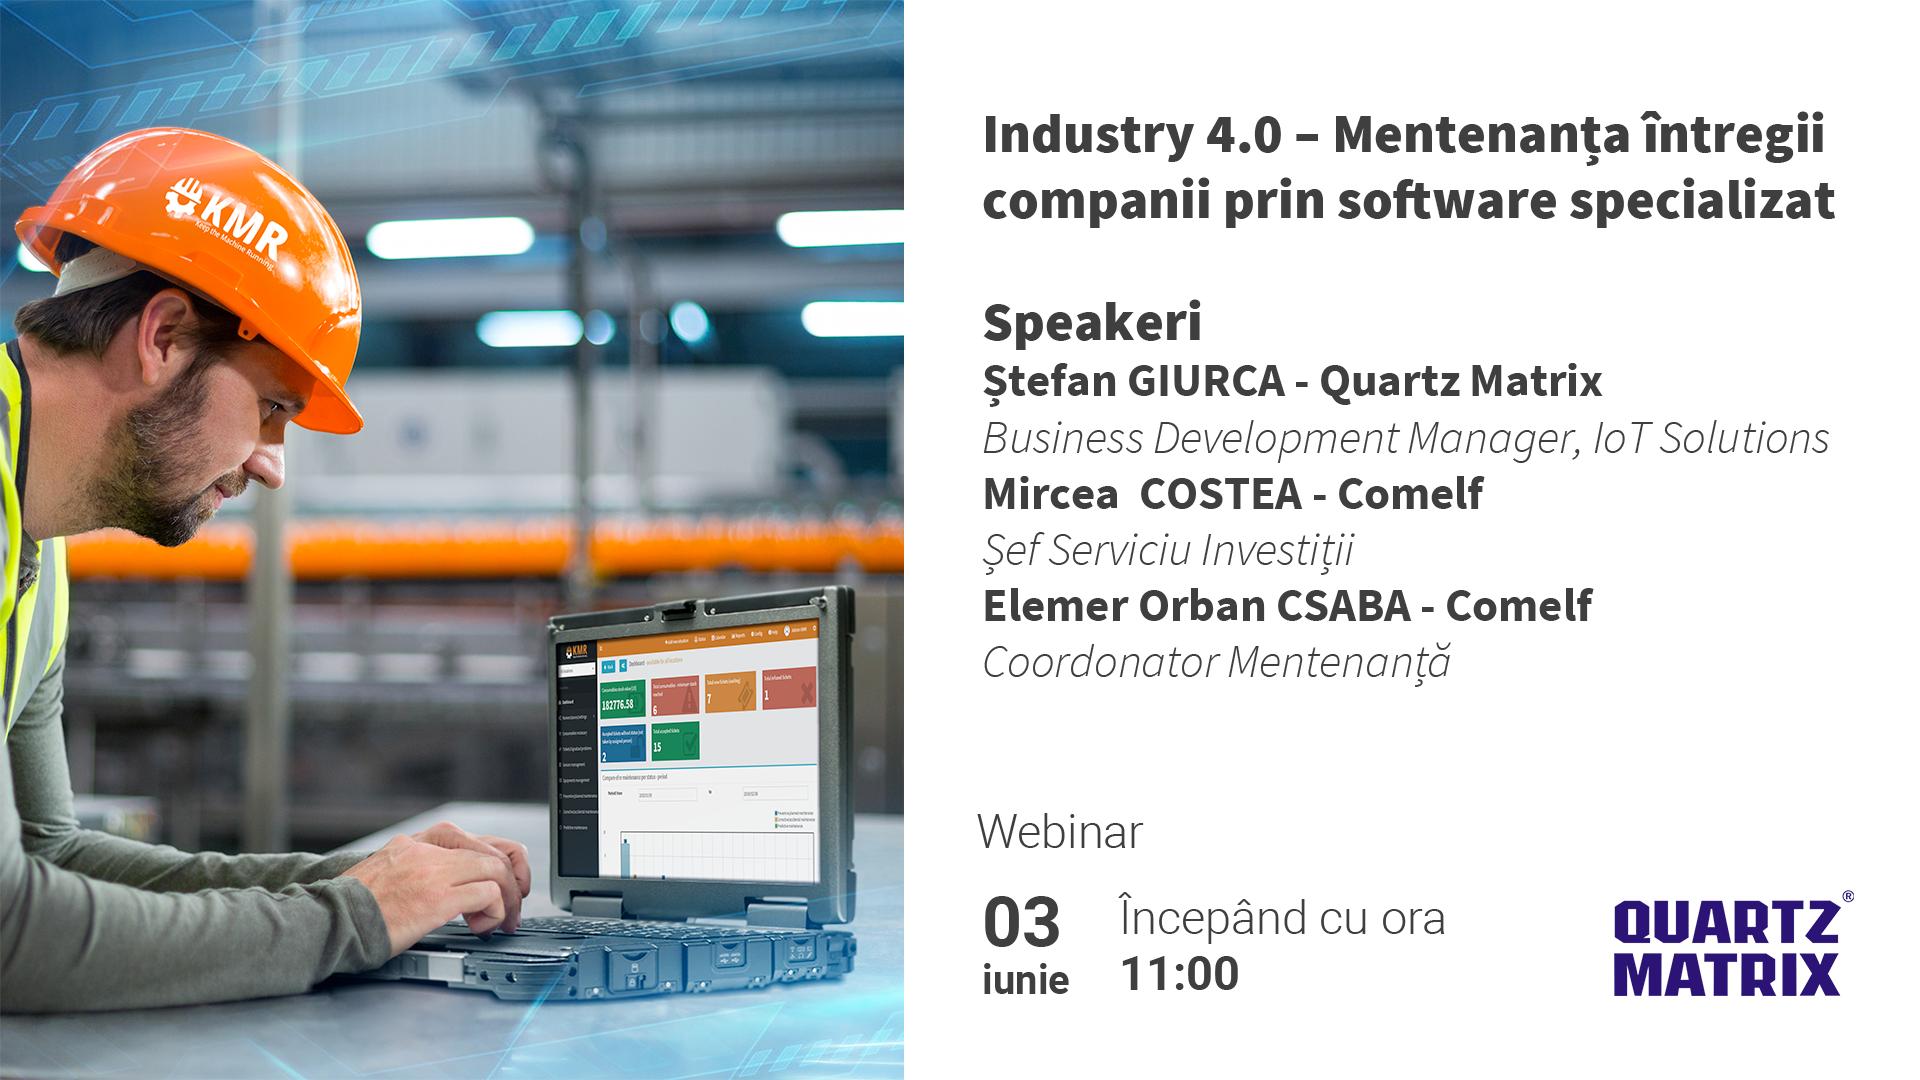 QM - Webinar Industry 4.0 – Mentenanaa intregii companii prin software specializat